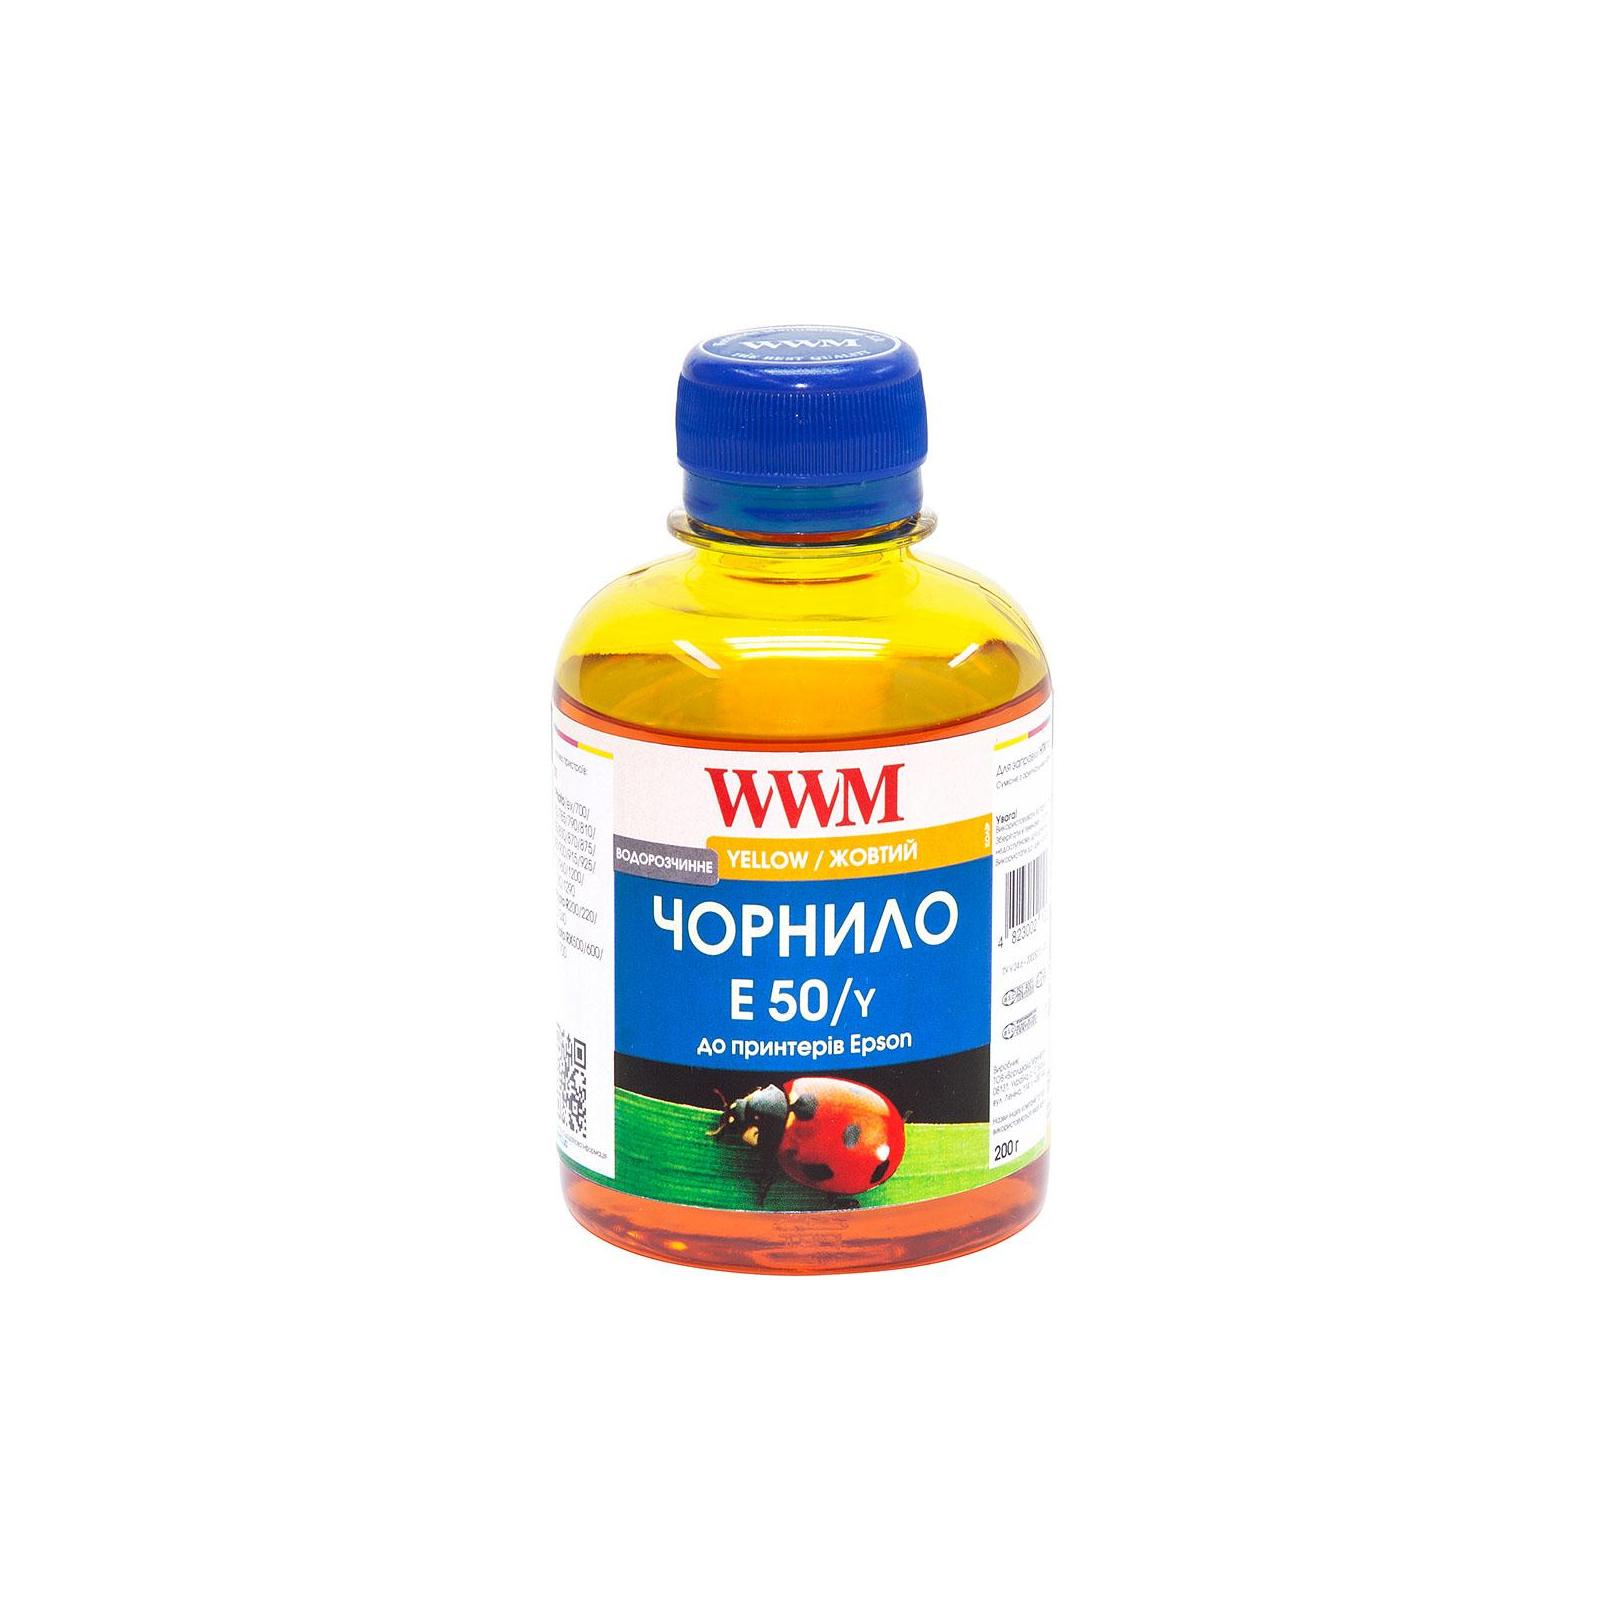 Чернила WWM Epson Stylus Universal yellow (E50/Y)